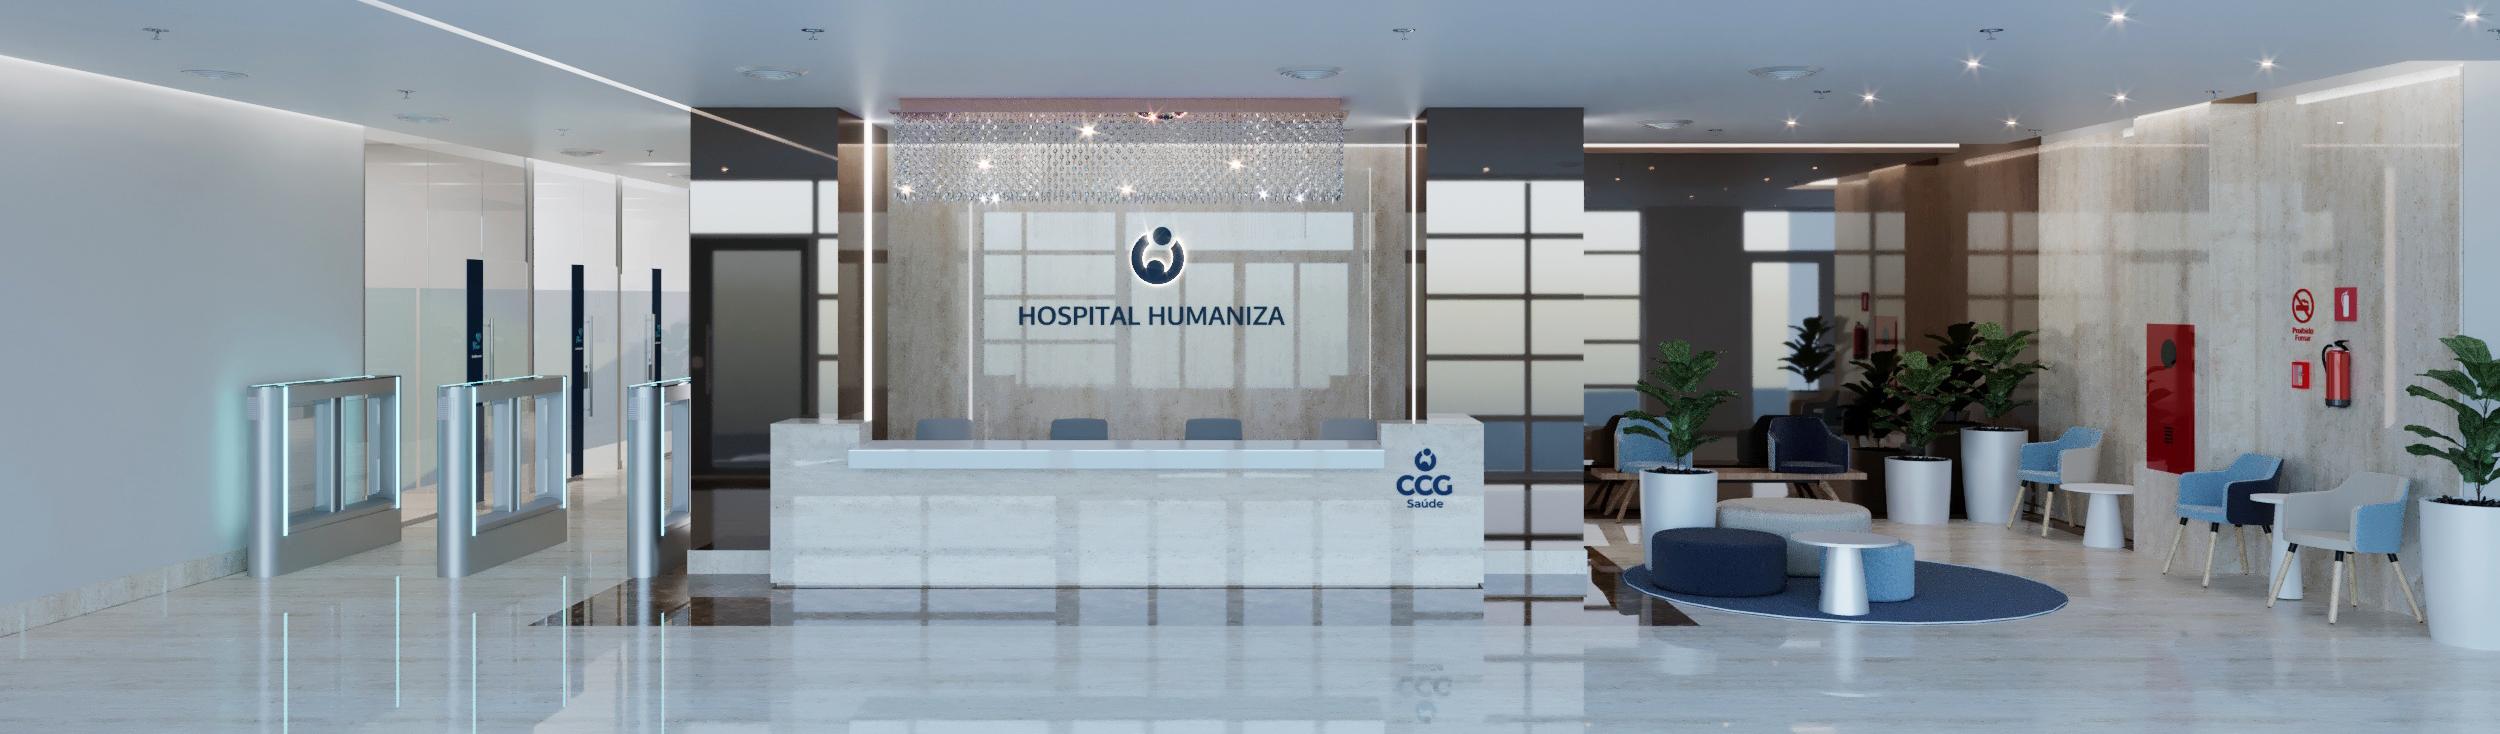 Hospital Humaniza CCG Saúde